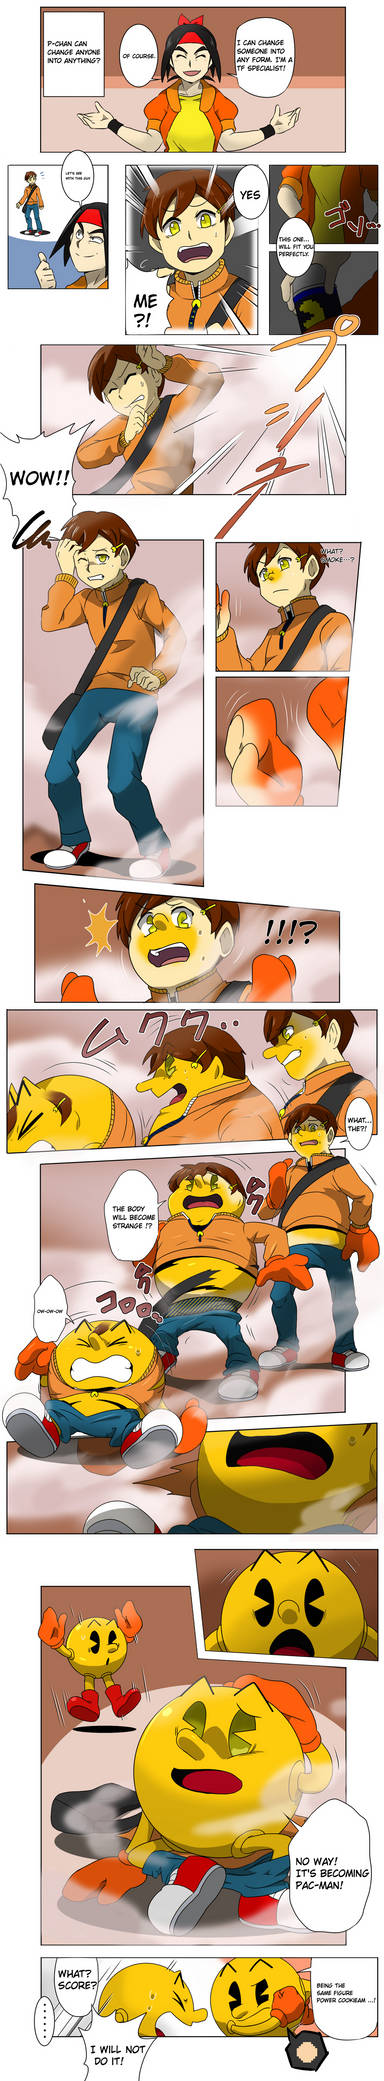 Pac-Man transformation by Spray-POKA